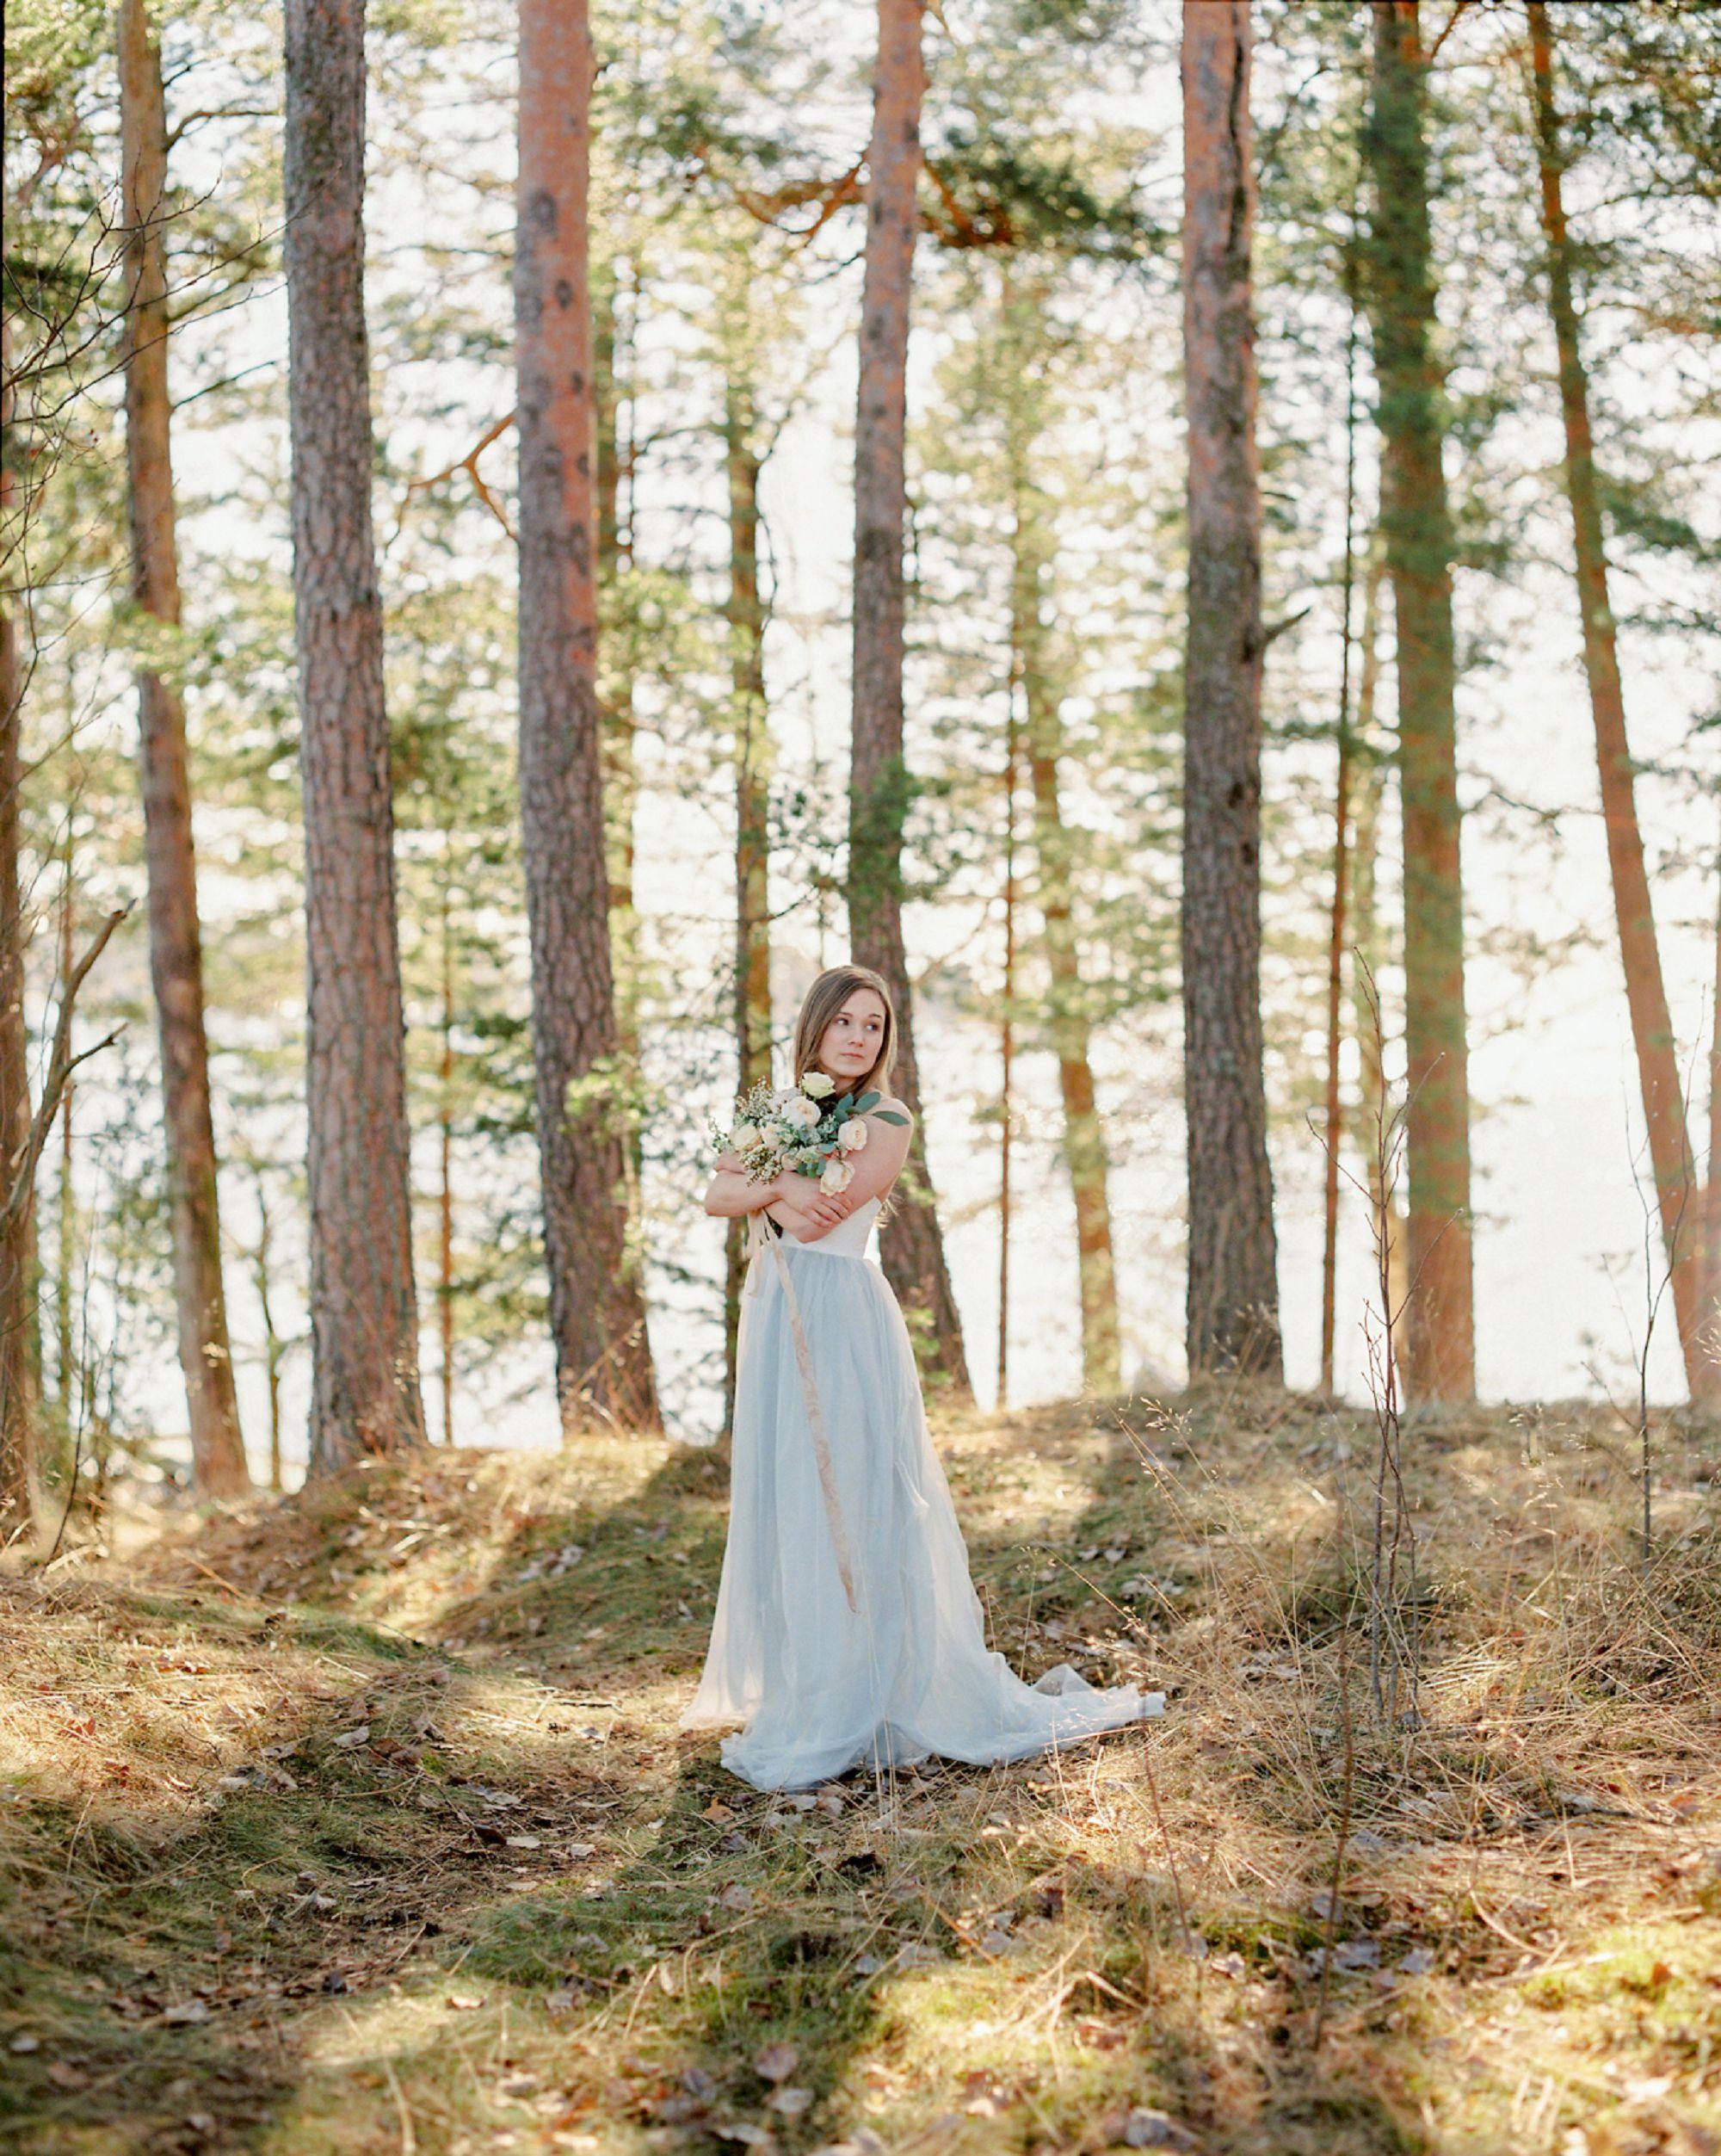 katja-scherle-festtagsfotografien_berlin-hamburg-filmweddingphotographer-hochzeitsfotograf-analog-warm-organic-bridal-boudoir-braut_0360